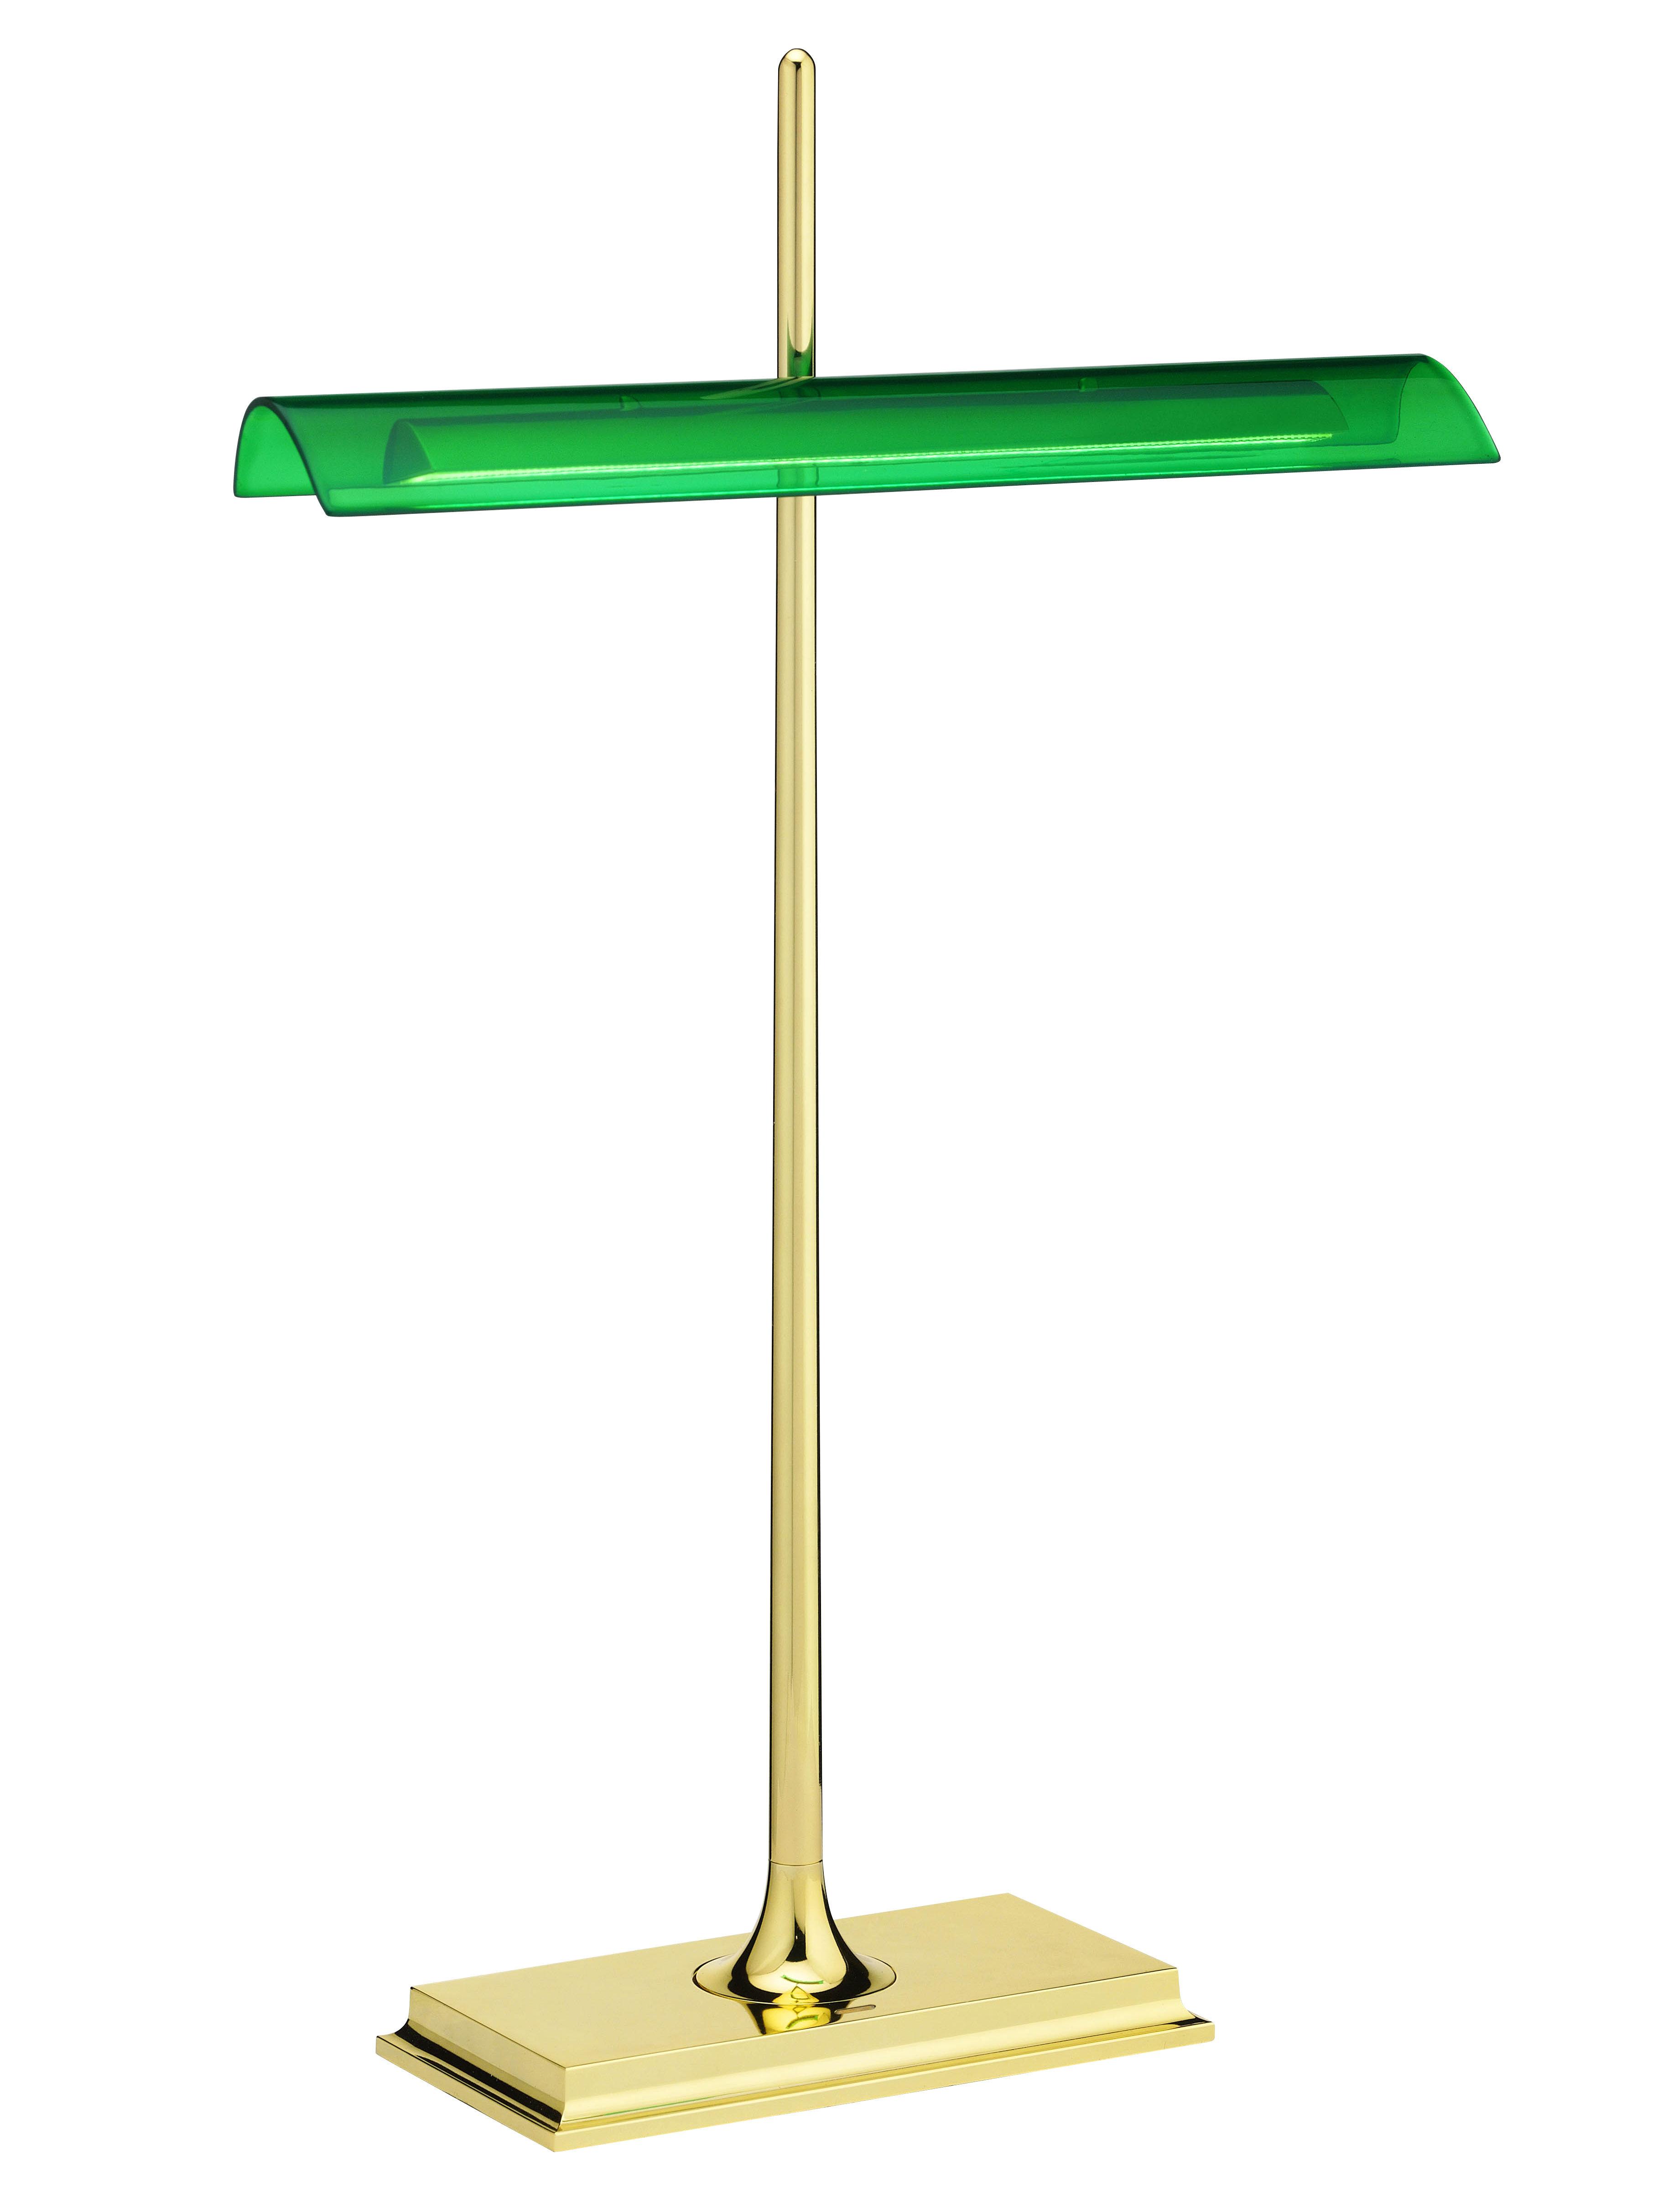 Luminaire - Lampes de table - Lampe de table Goldman LED - Flos - Vert / Or - Aluminium peint, Méthacrylate